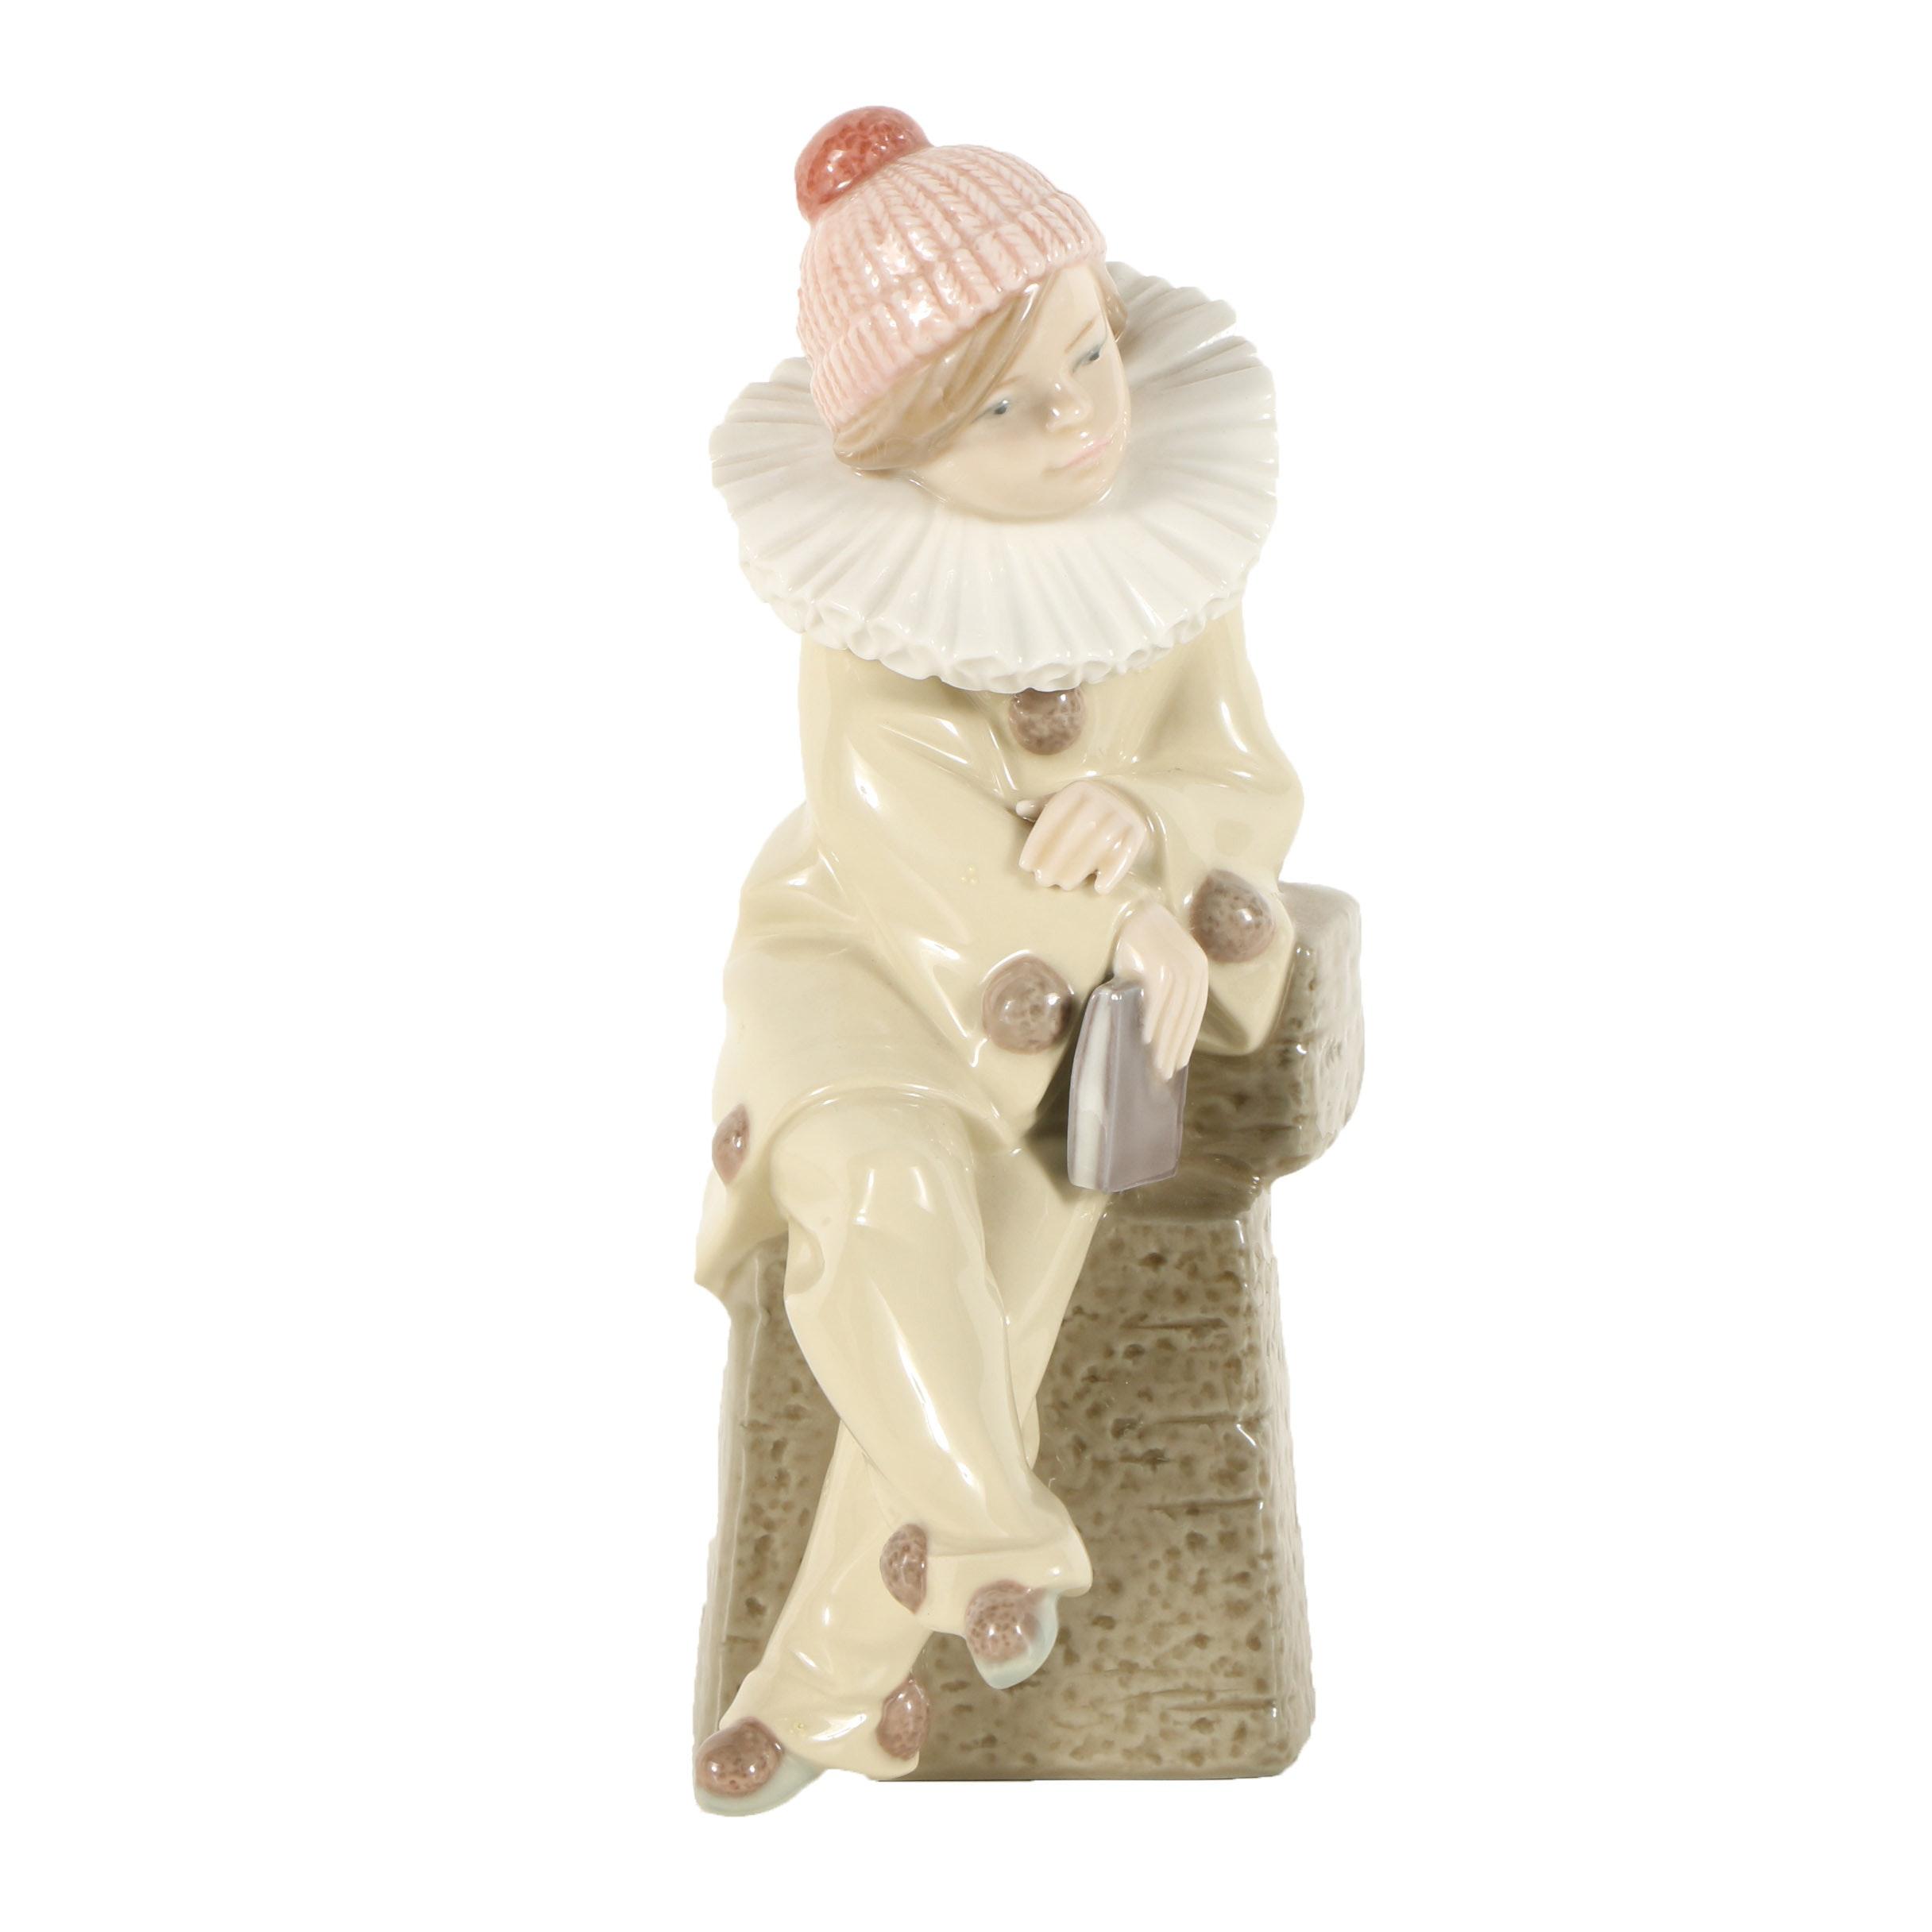 "Lladró Porcelain Figurine ""Little Jester"""